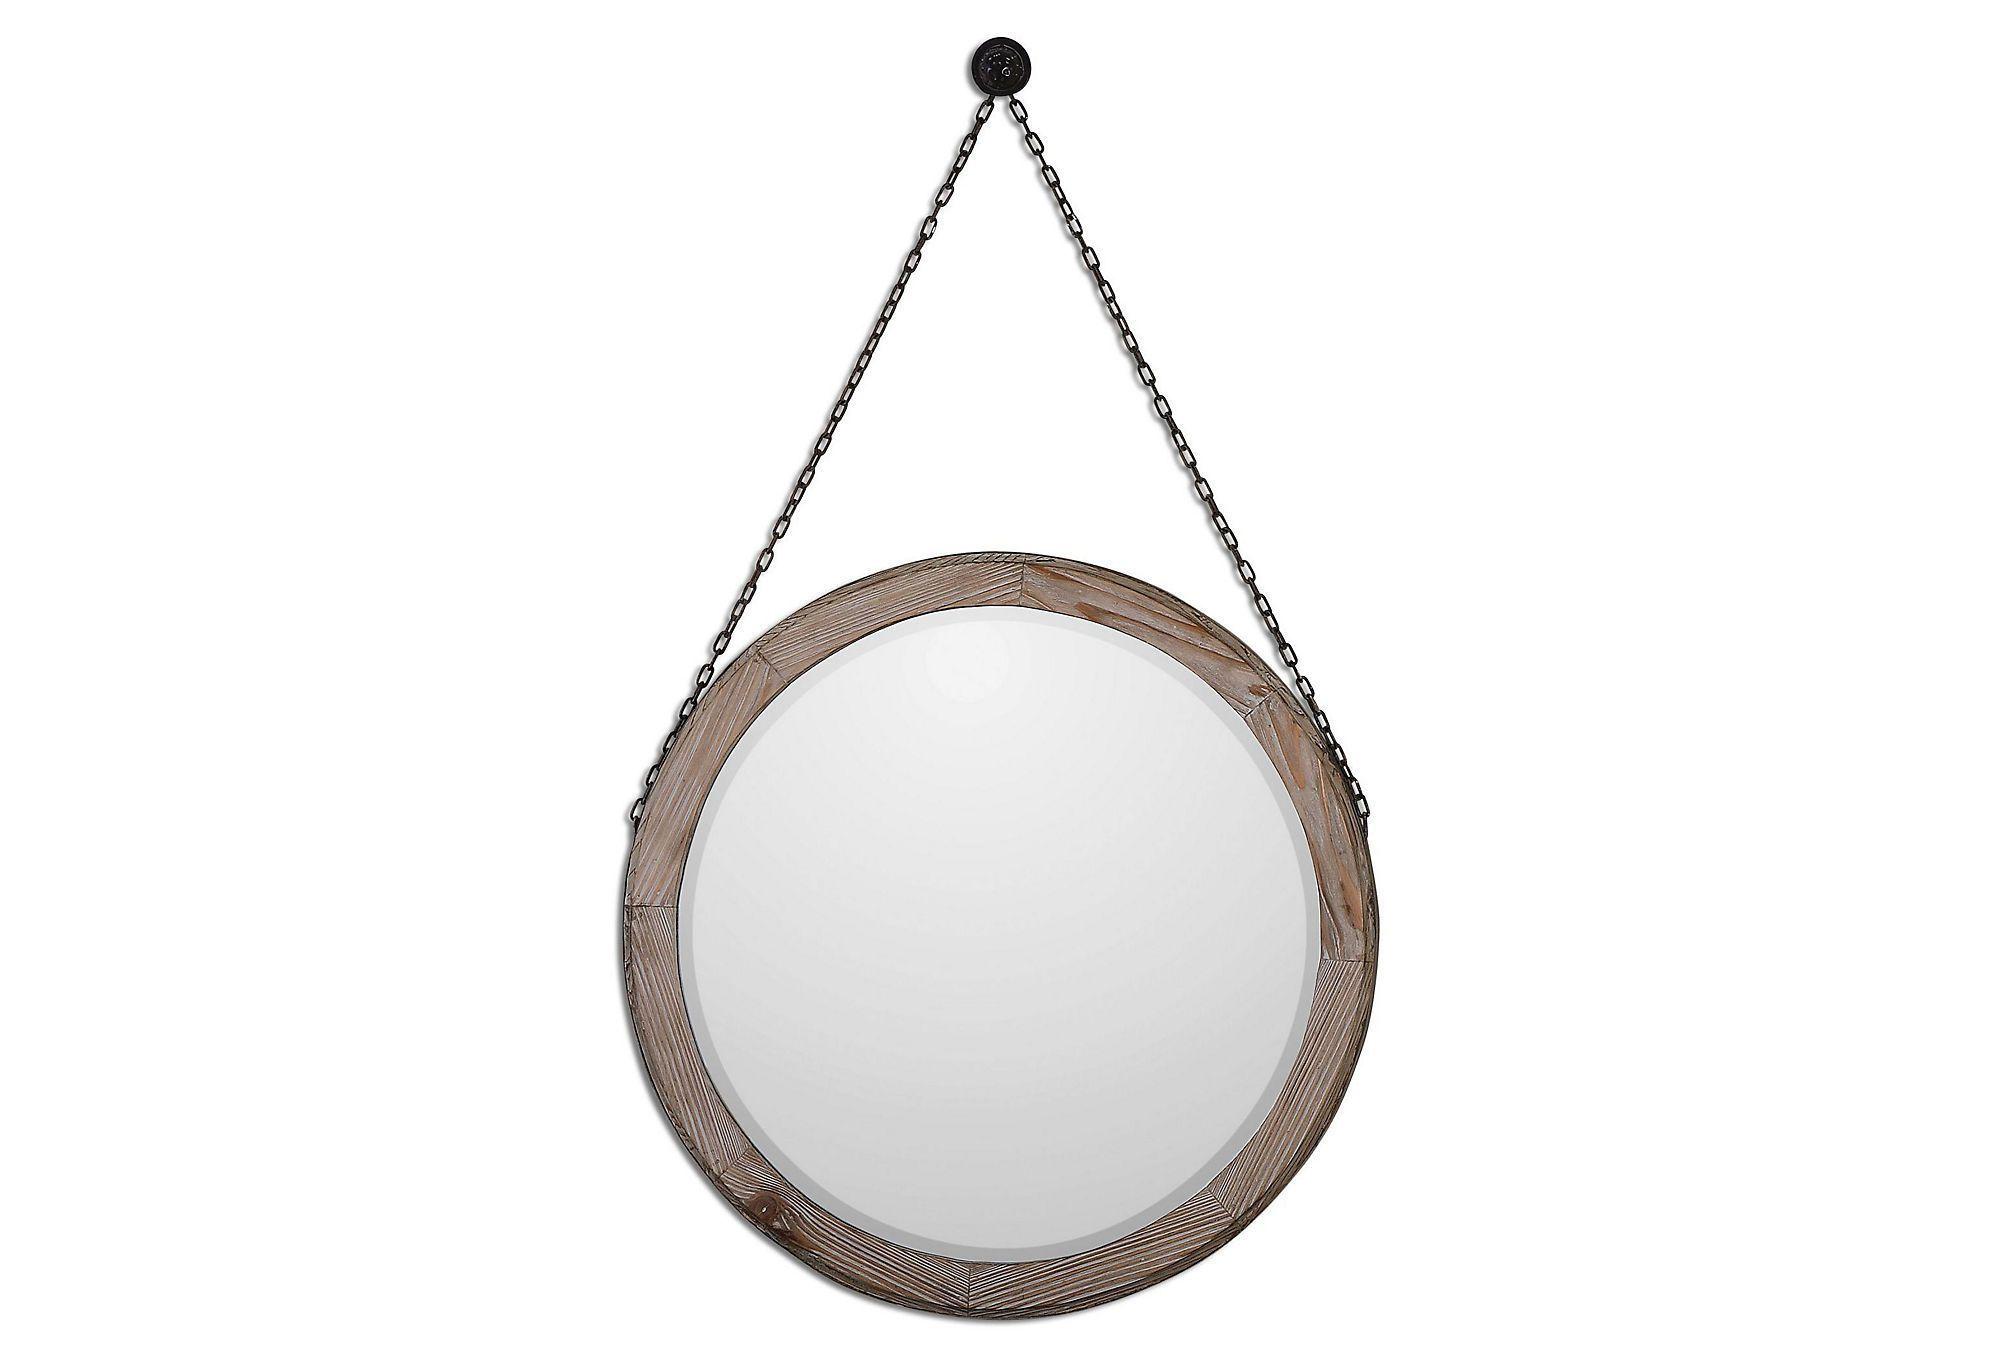 Logan Wall Mirror, Rustic | One Kings Lane